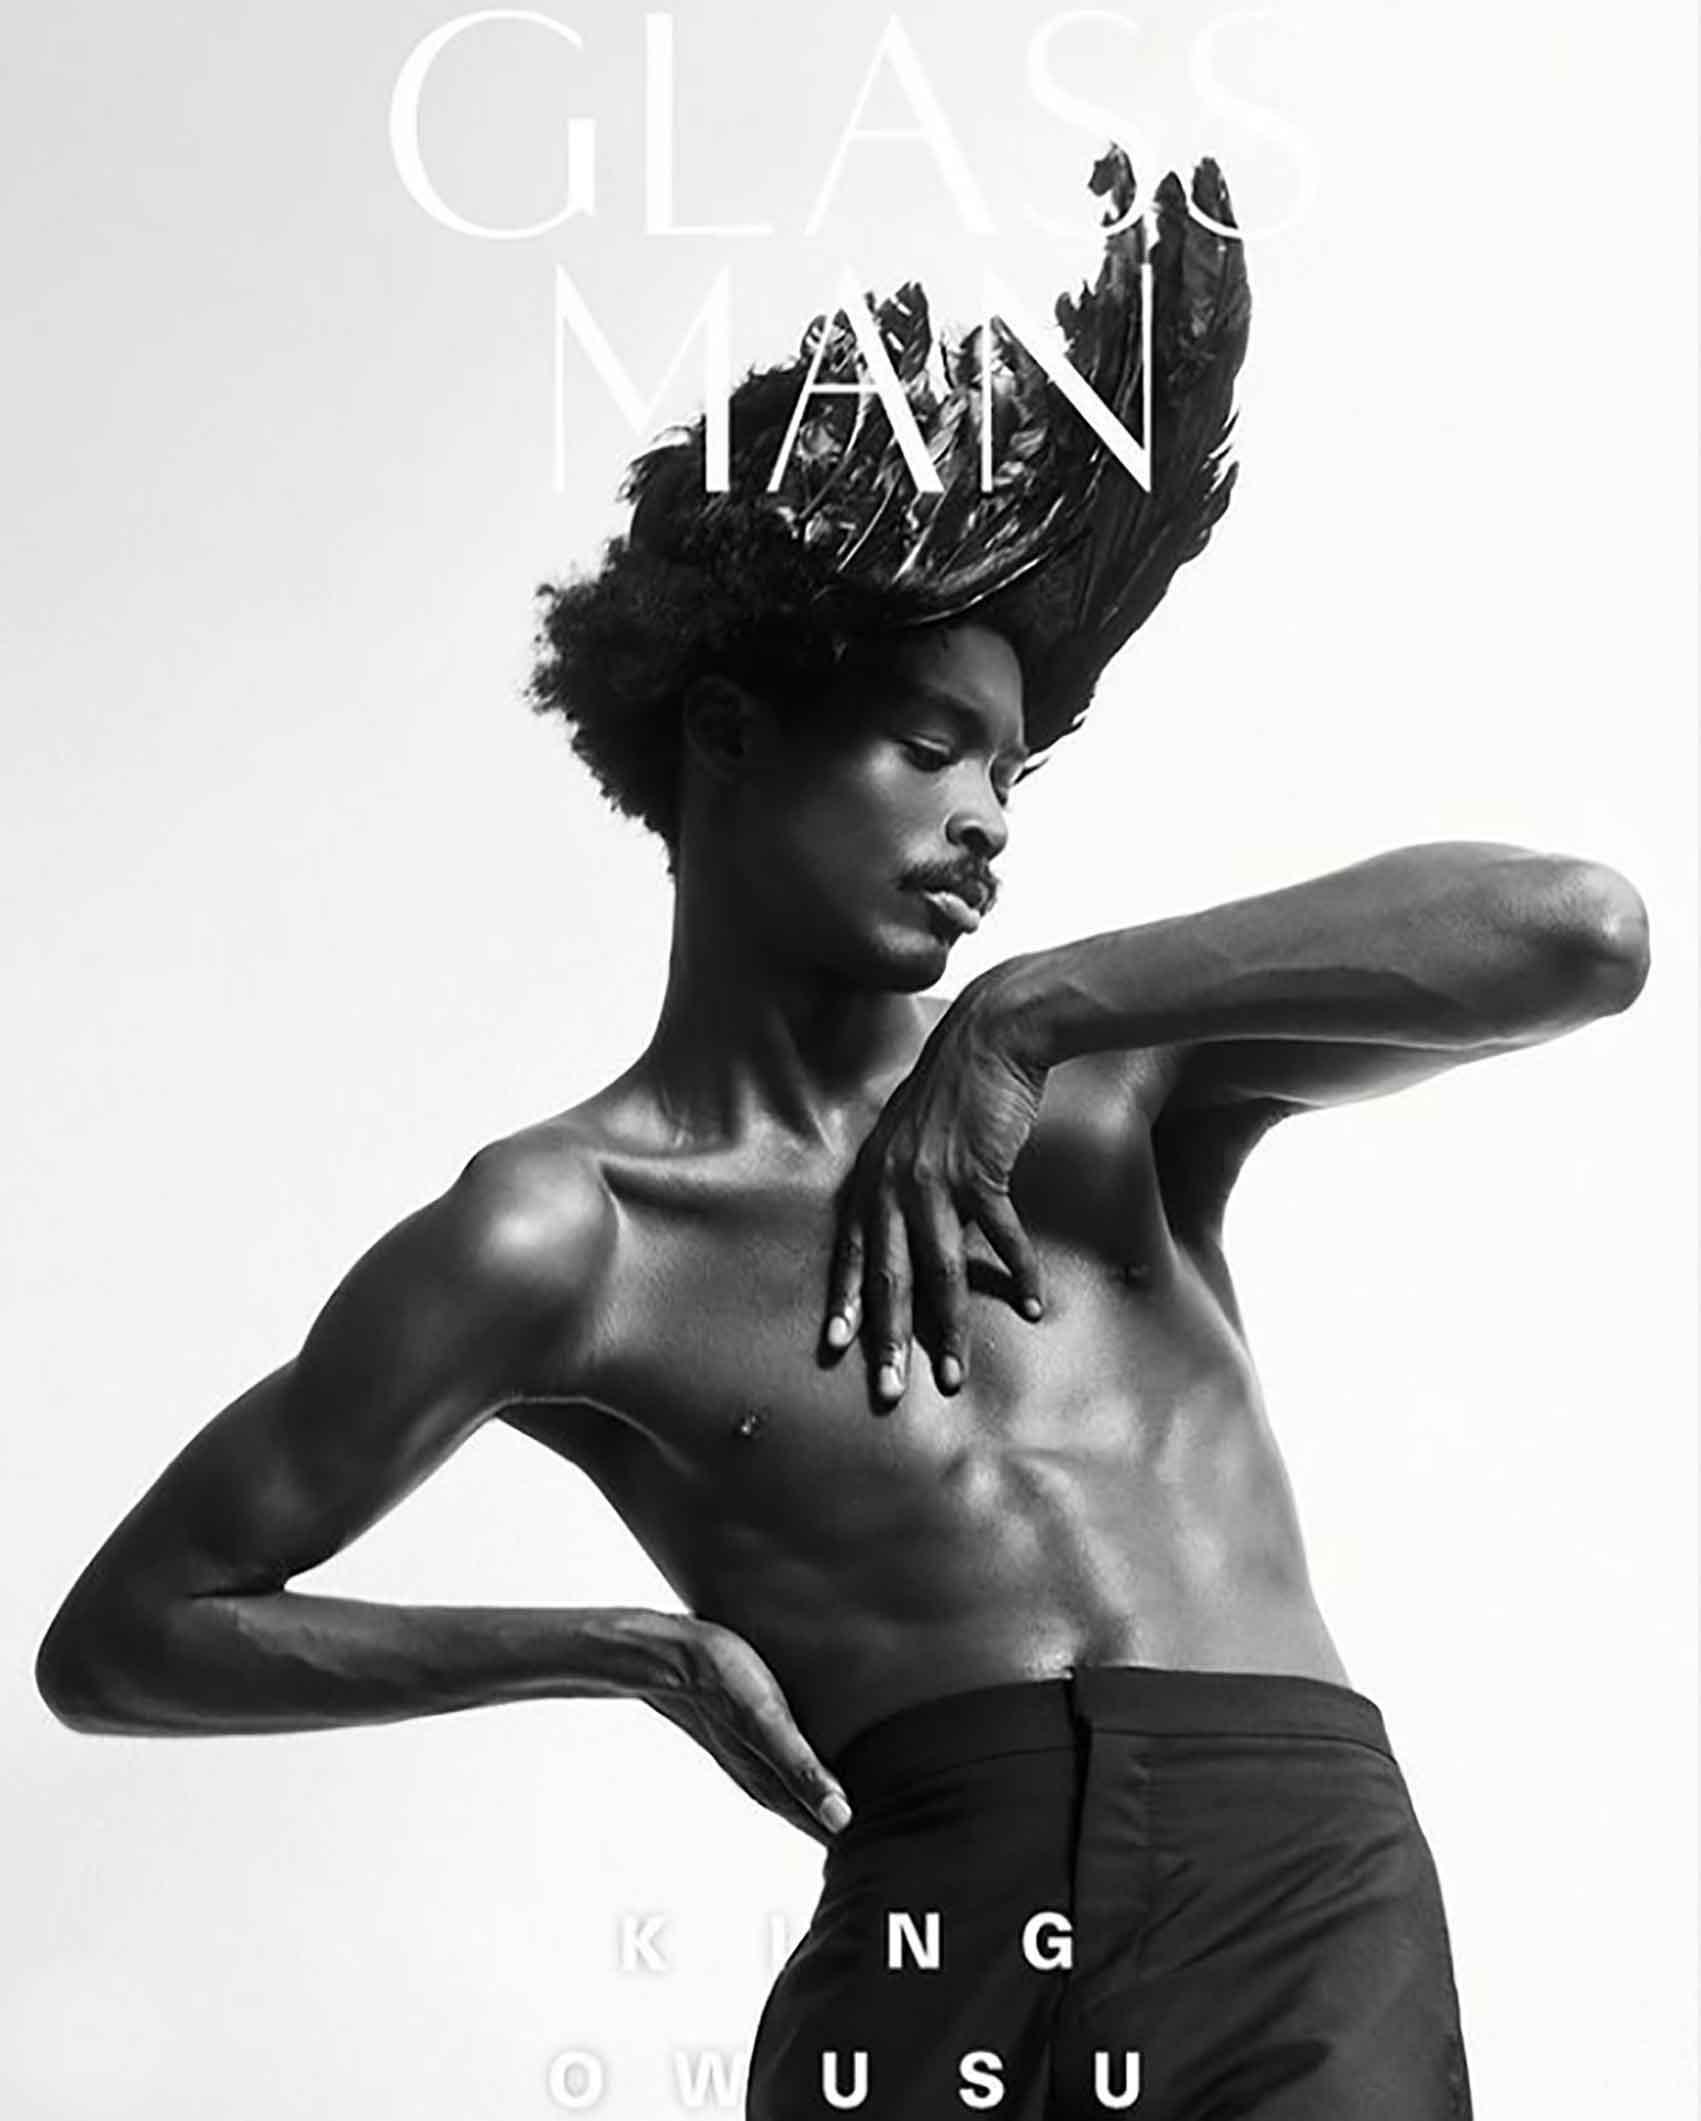 The-Glass-Magazine-מגזין-אופנה